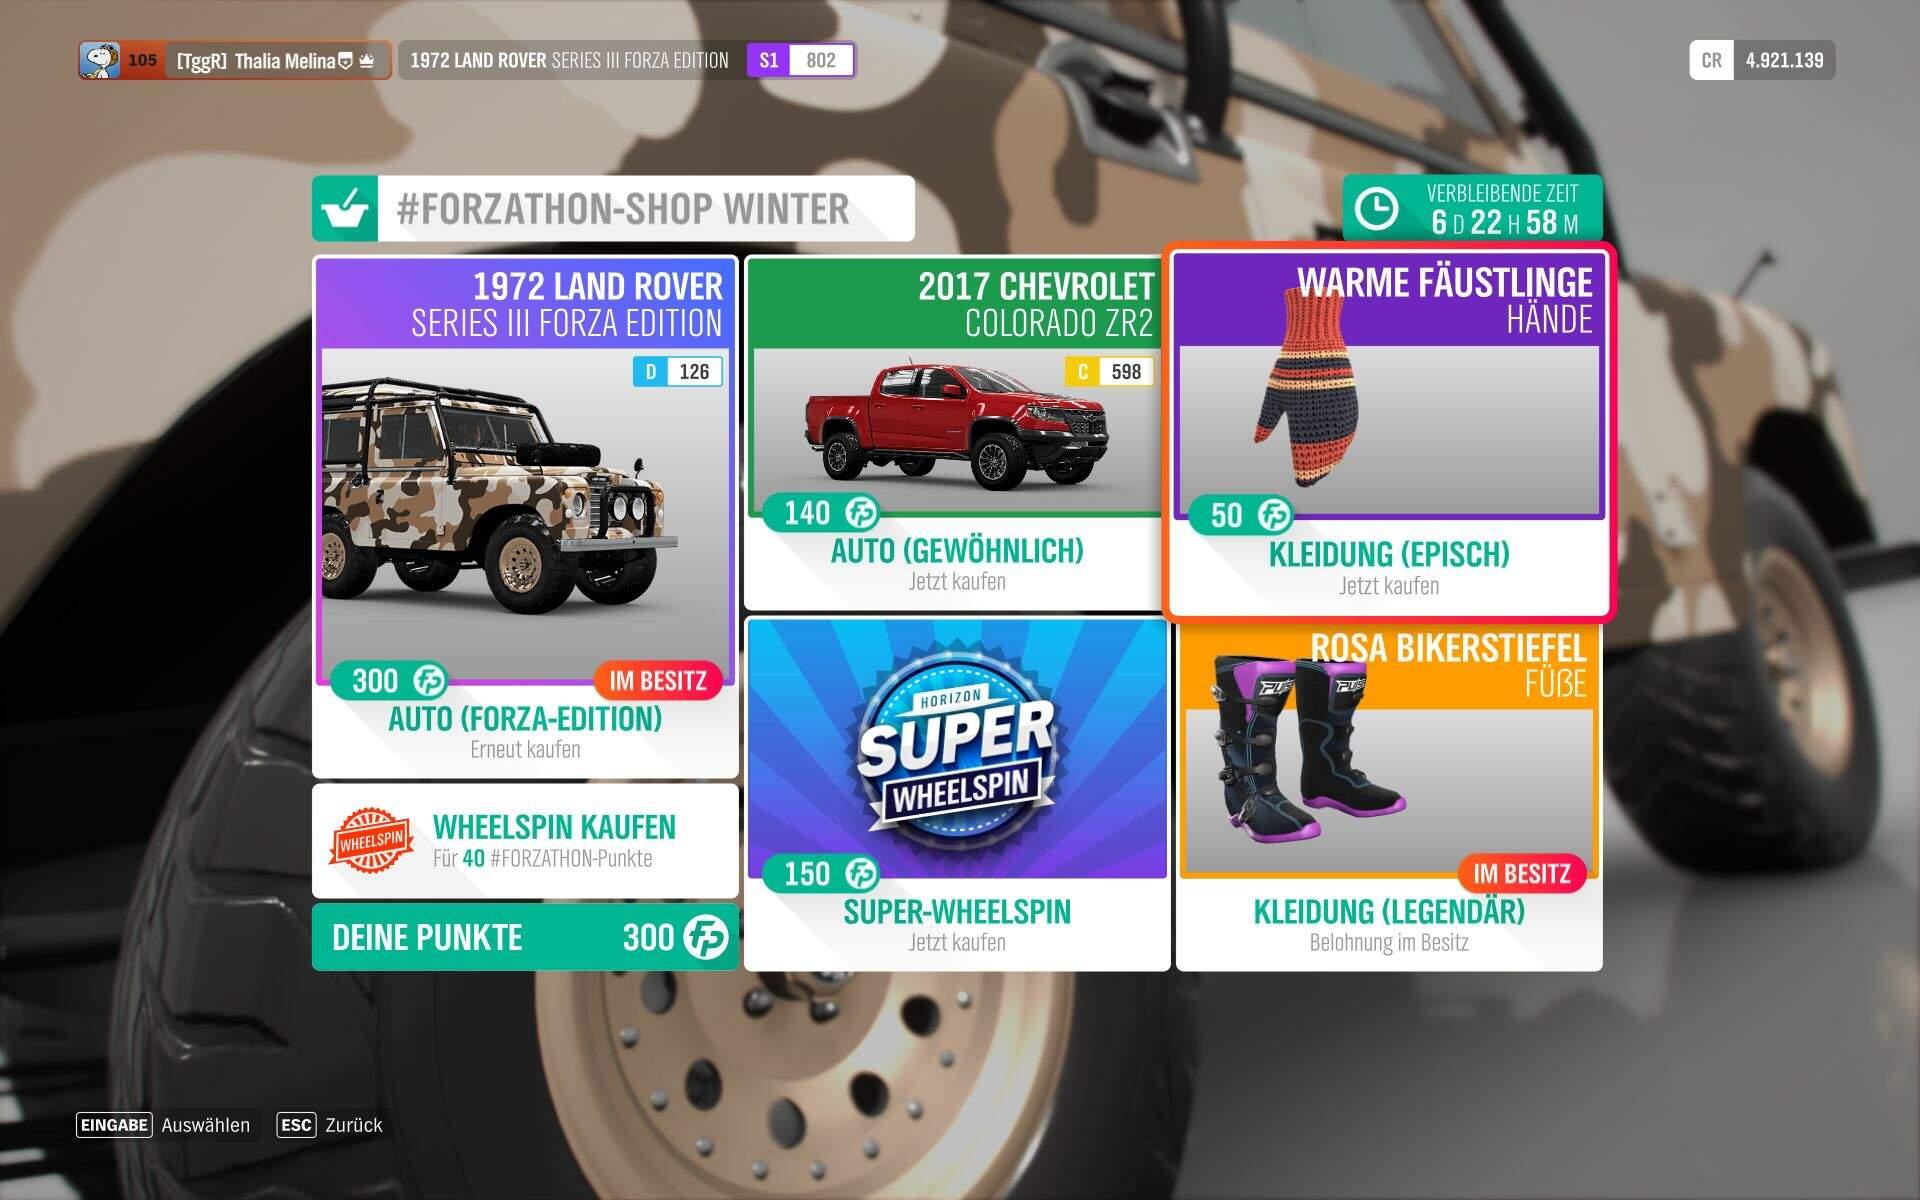 Forza Horizon 4 Winter Forzathon-Shop